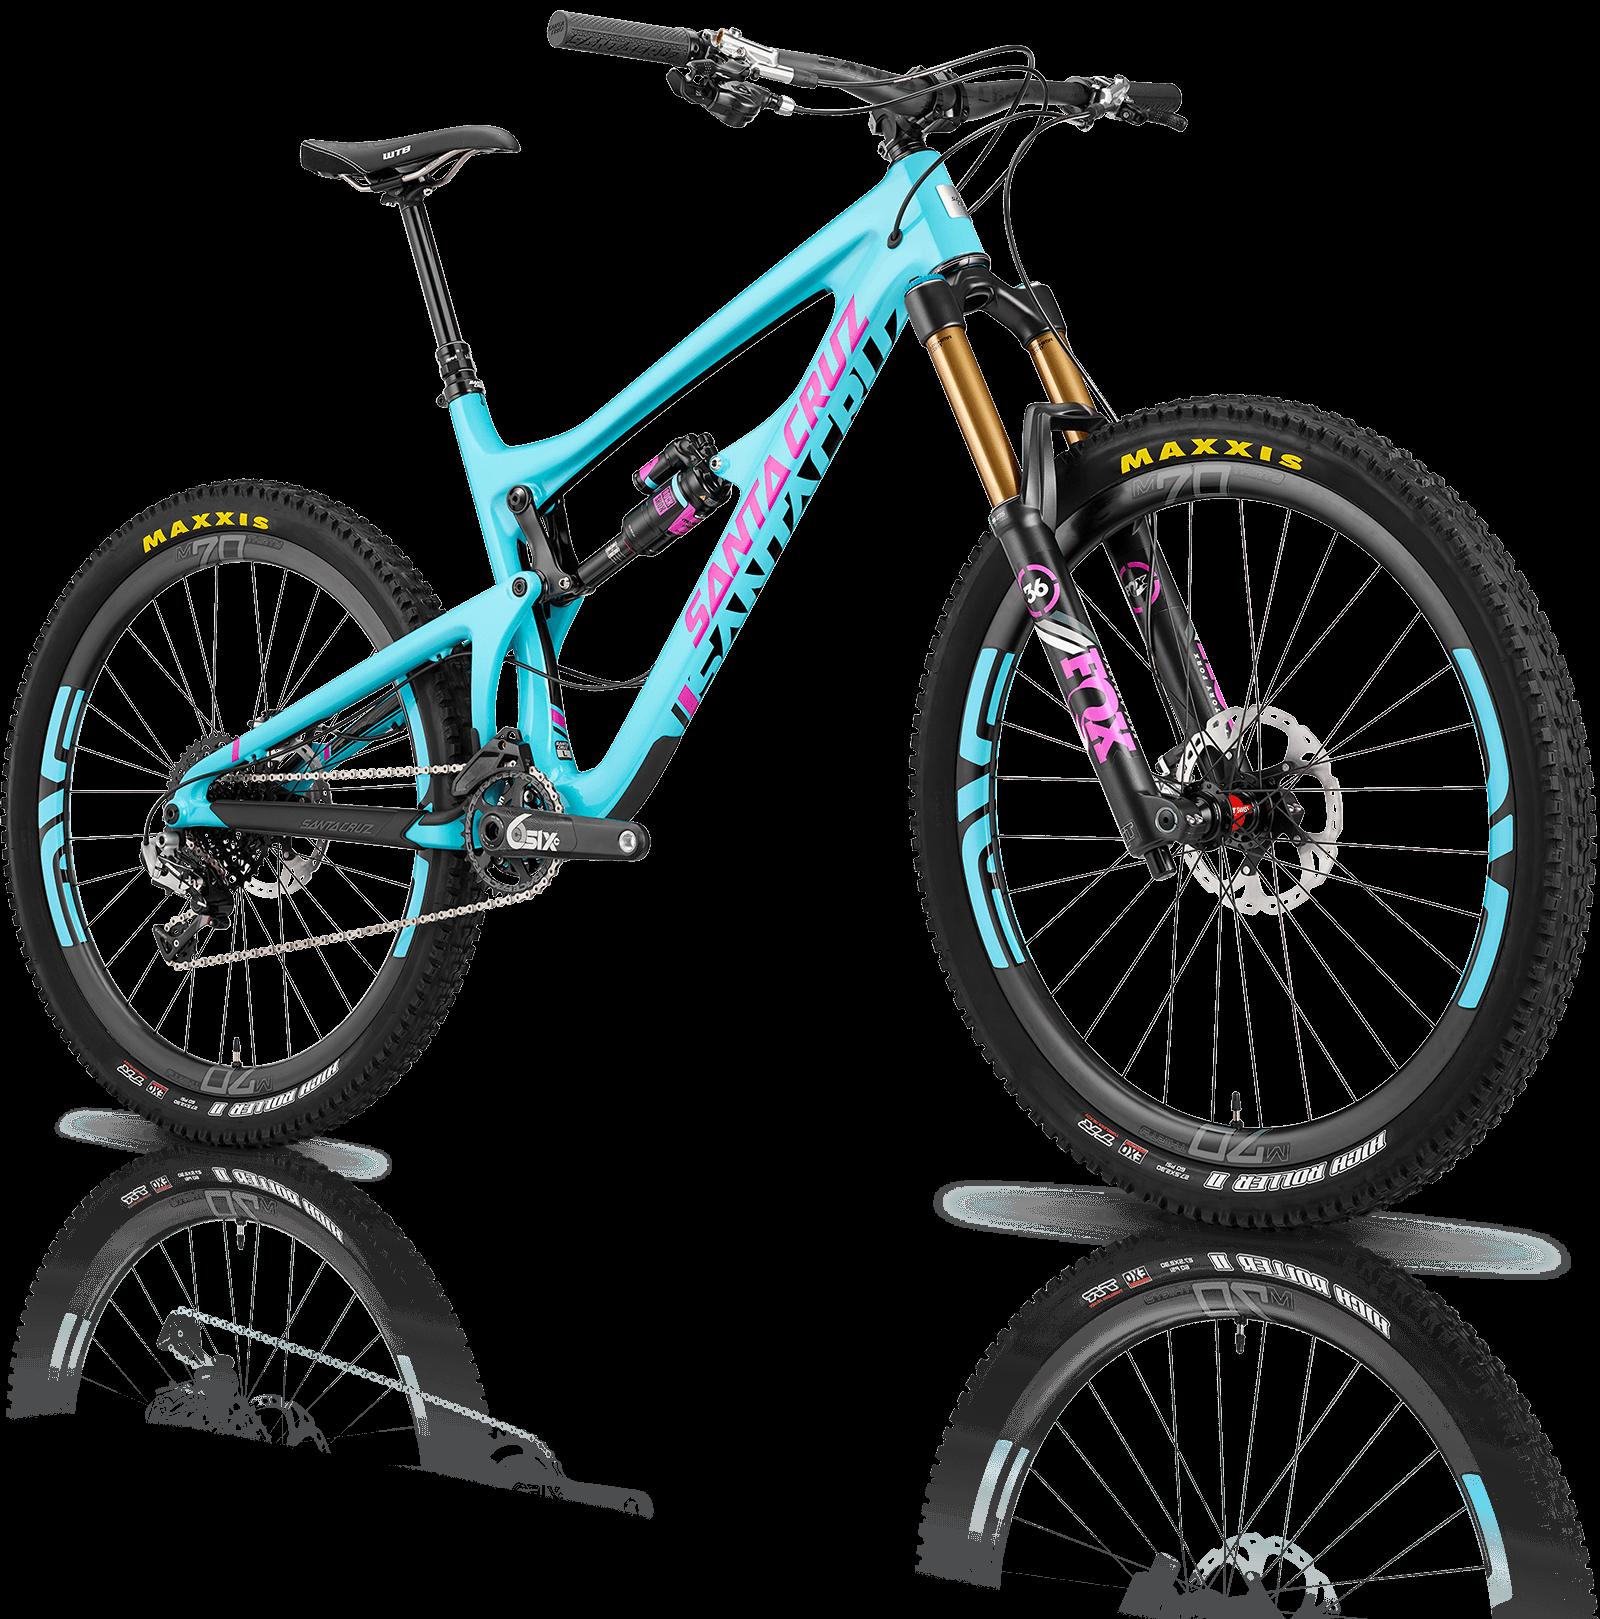 Santa Cruz Nomad with Enve wheels